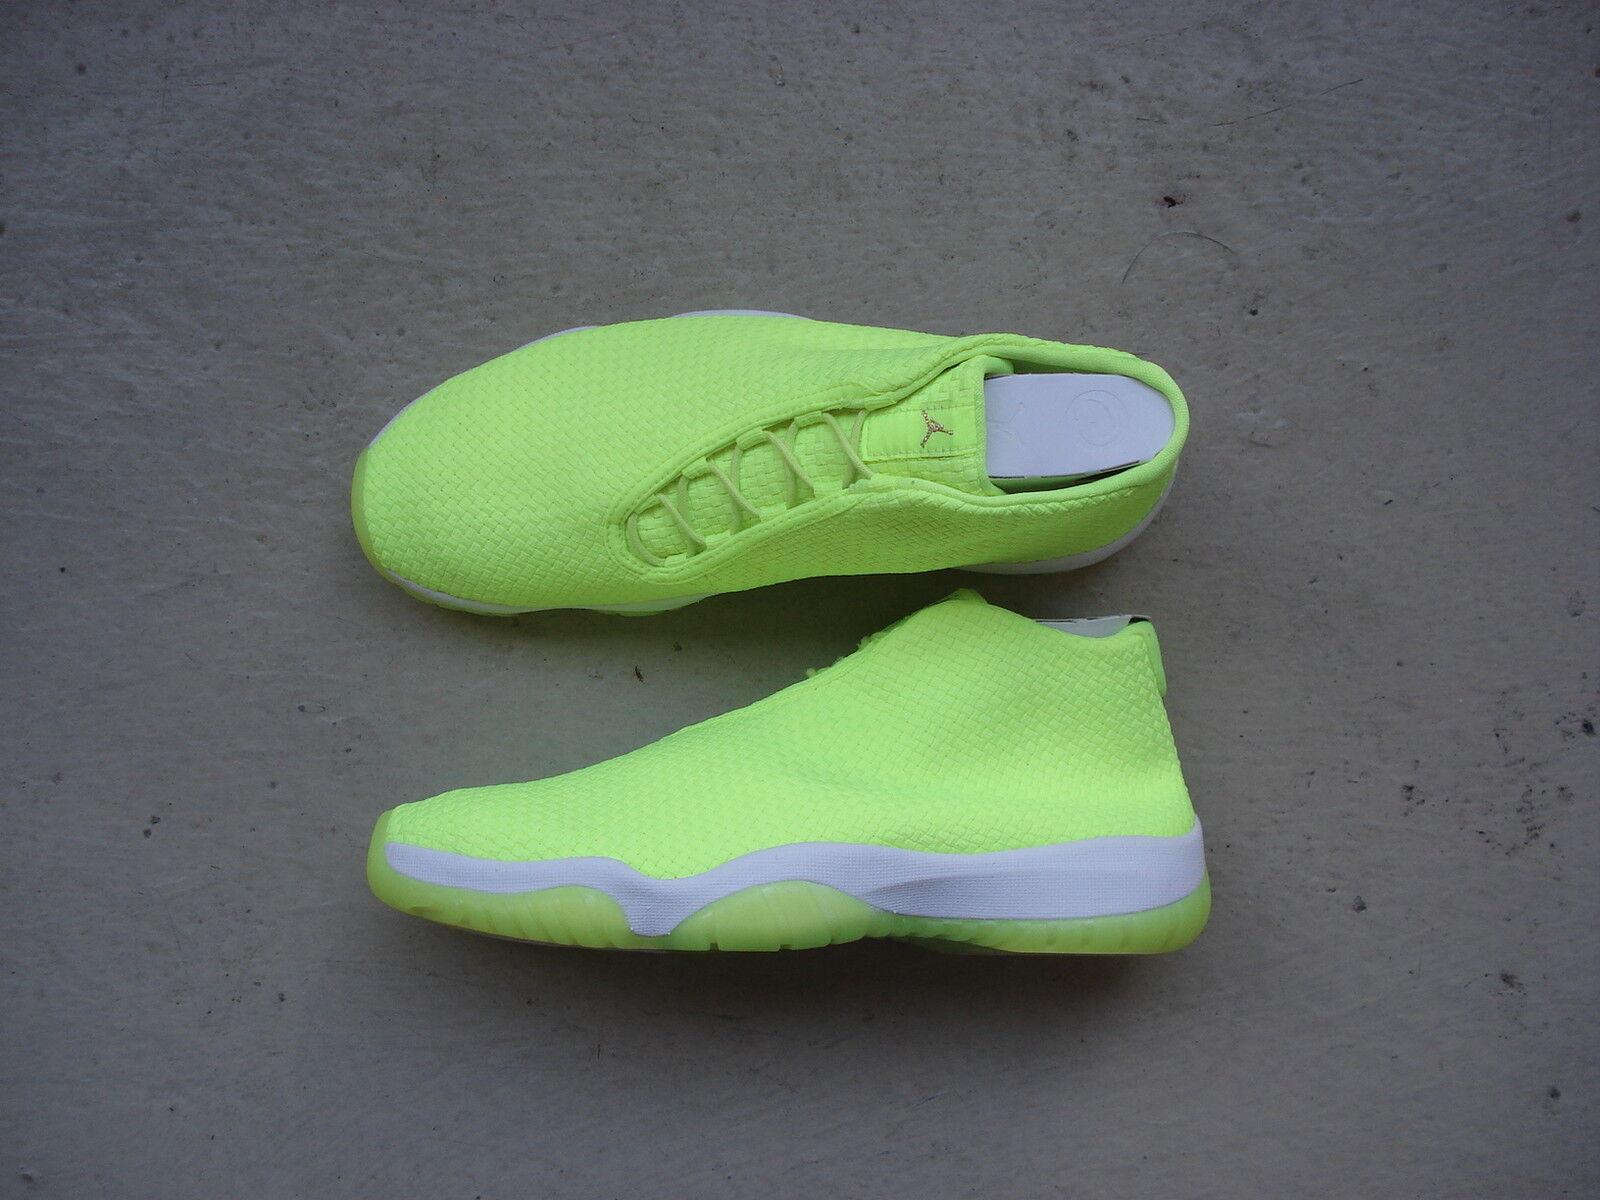 Nike Air Jordan Future Future Jordan 45 voltios/voltiosBlanco 830559